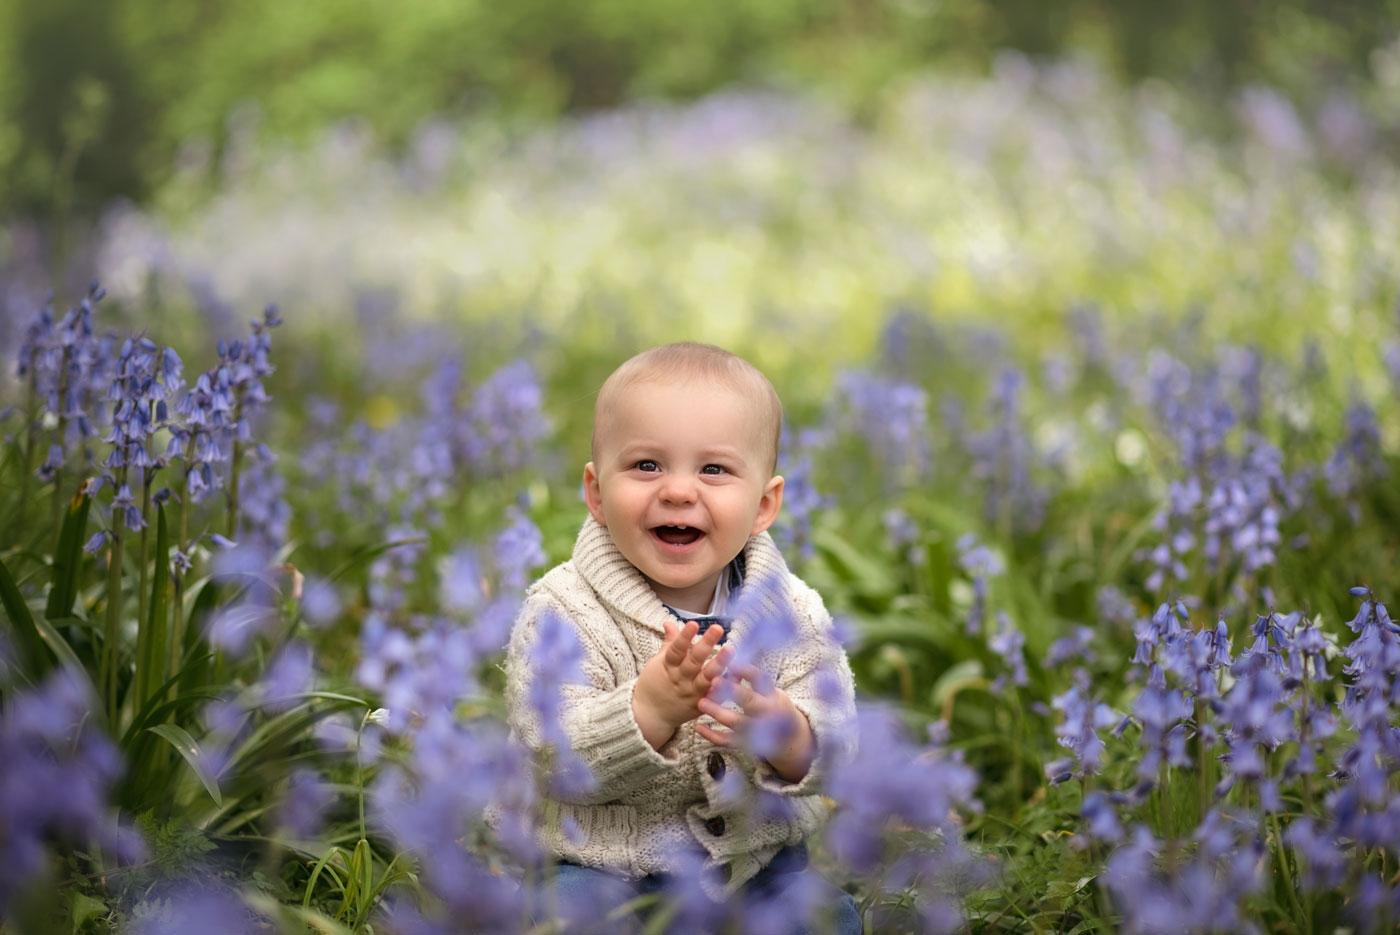 Outdoor baby photography in bluebells, Dorset